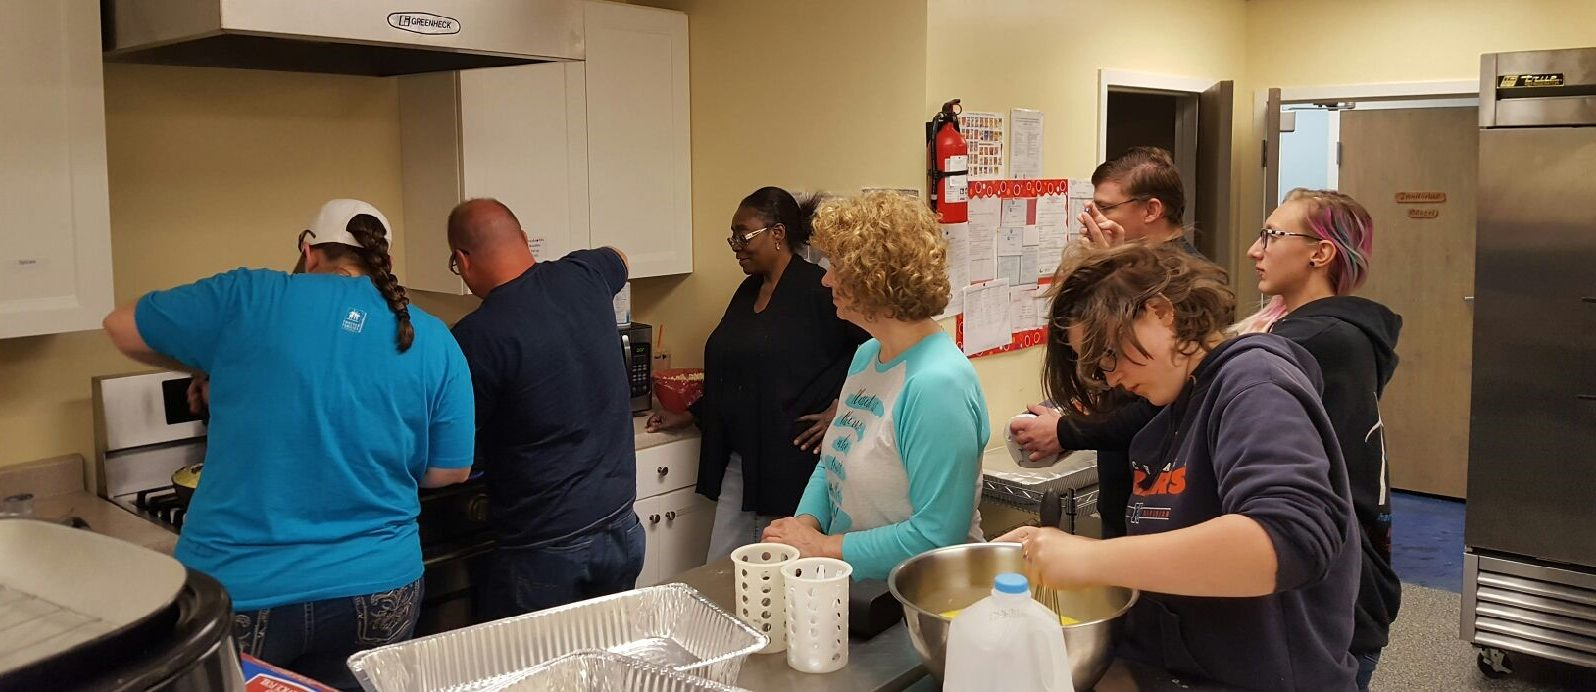 Providign breakfast to homeless in the Roseland community of Chicago